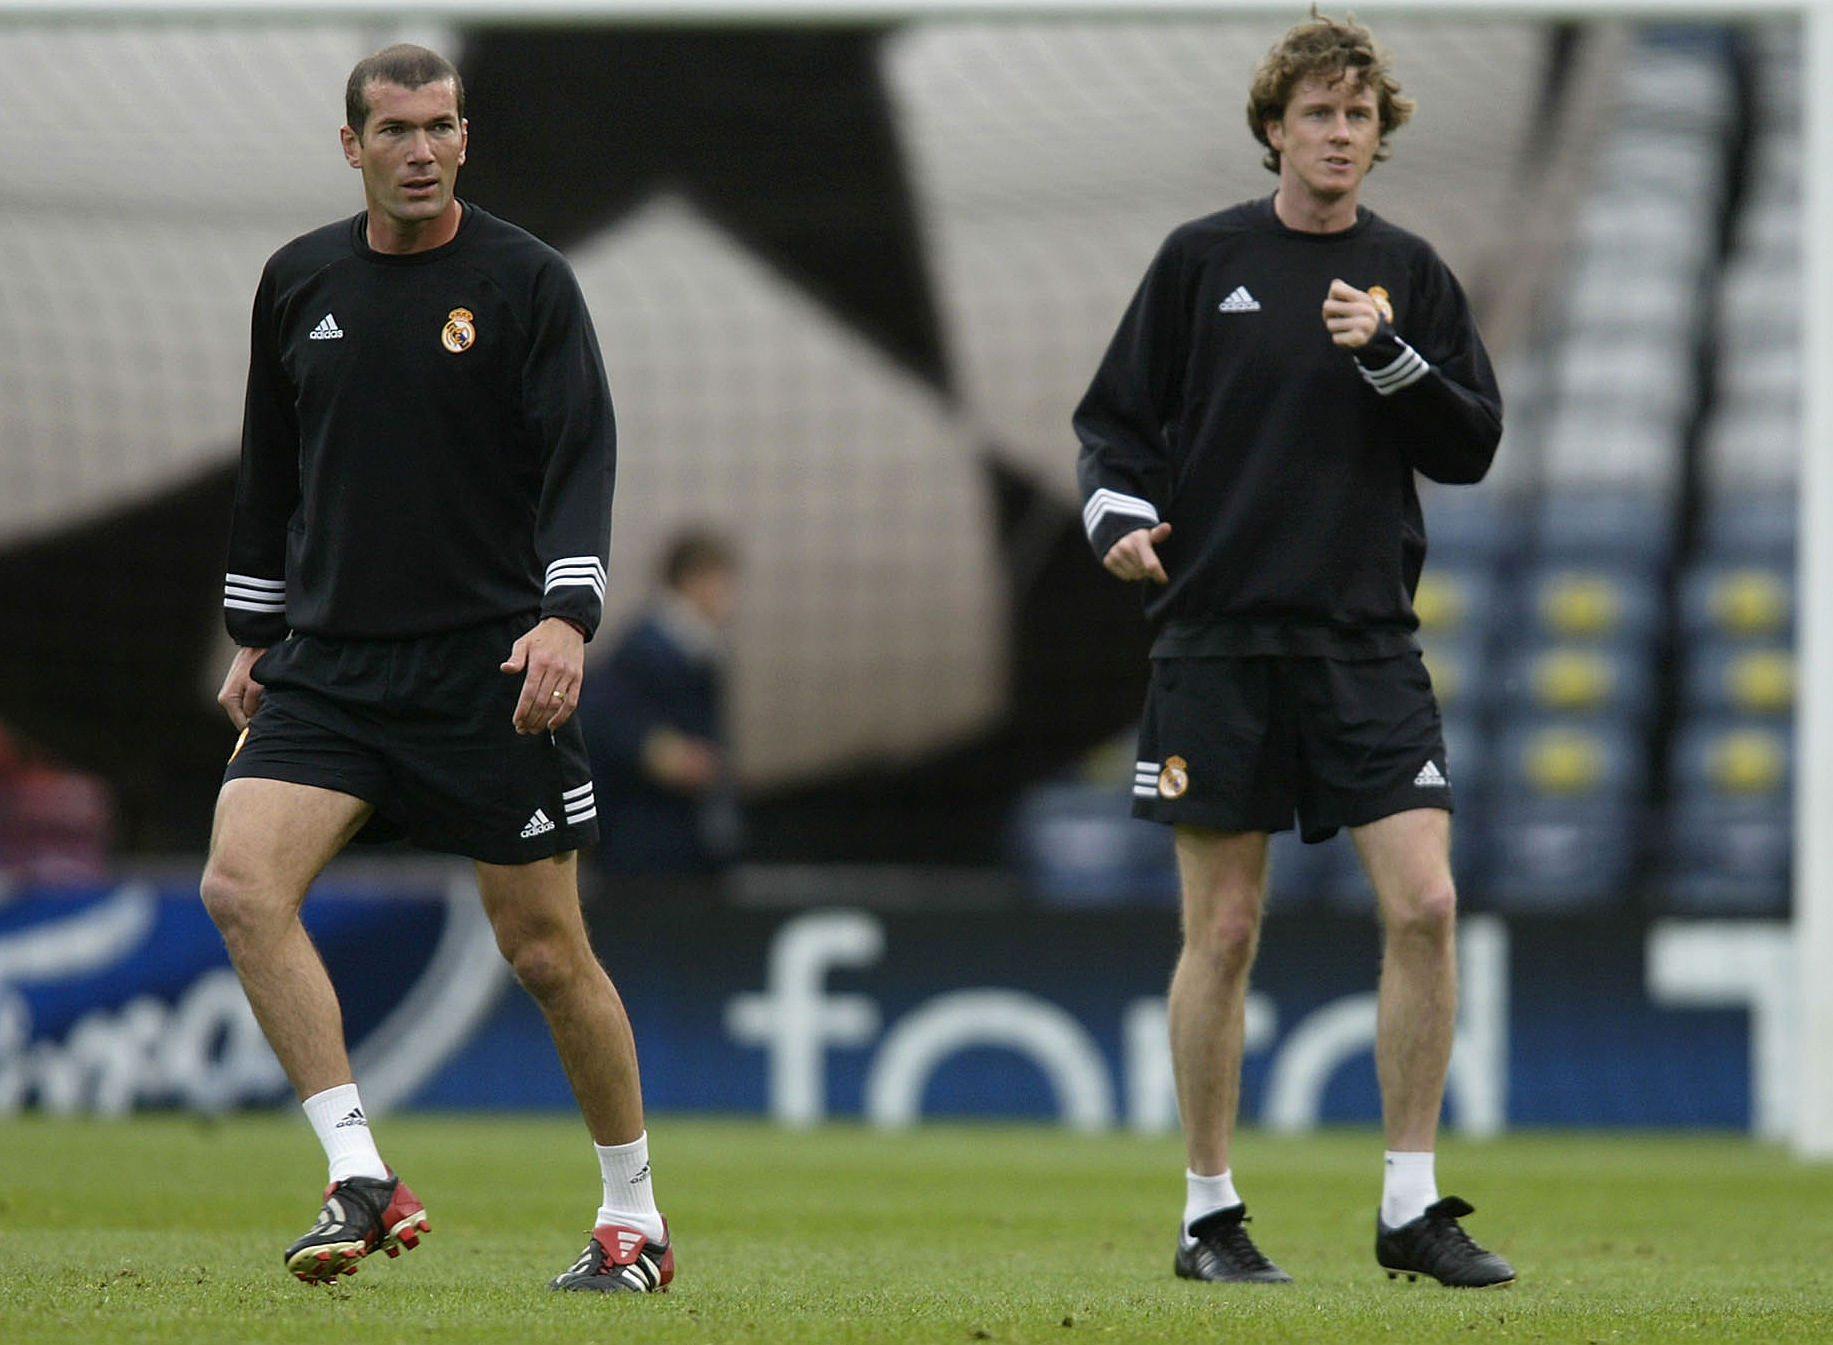 Zinedine Zidane Steve McManaman Real Madrid 2002